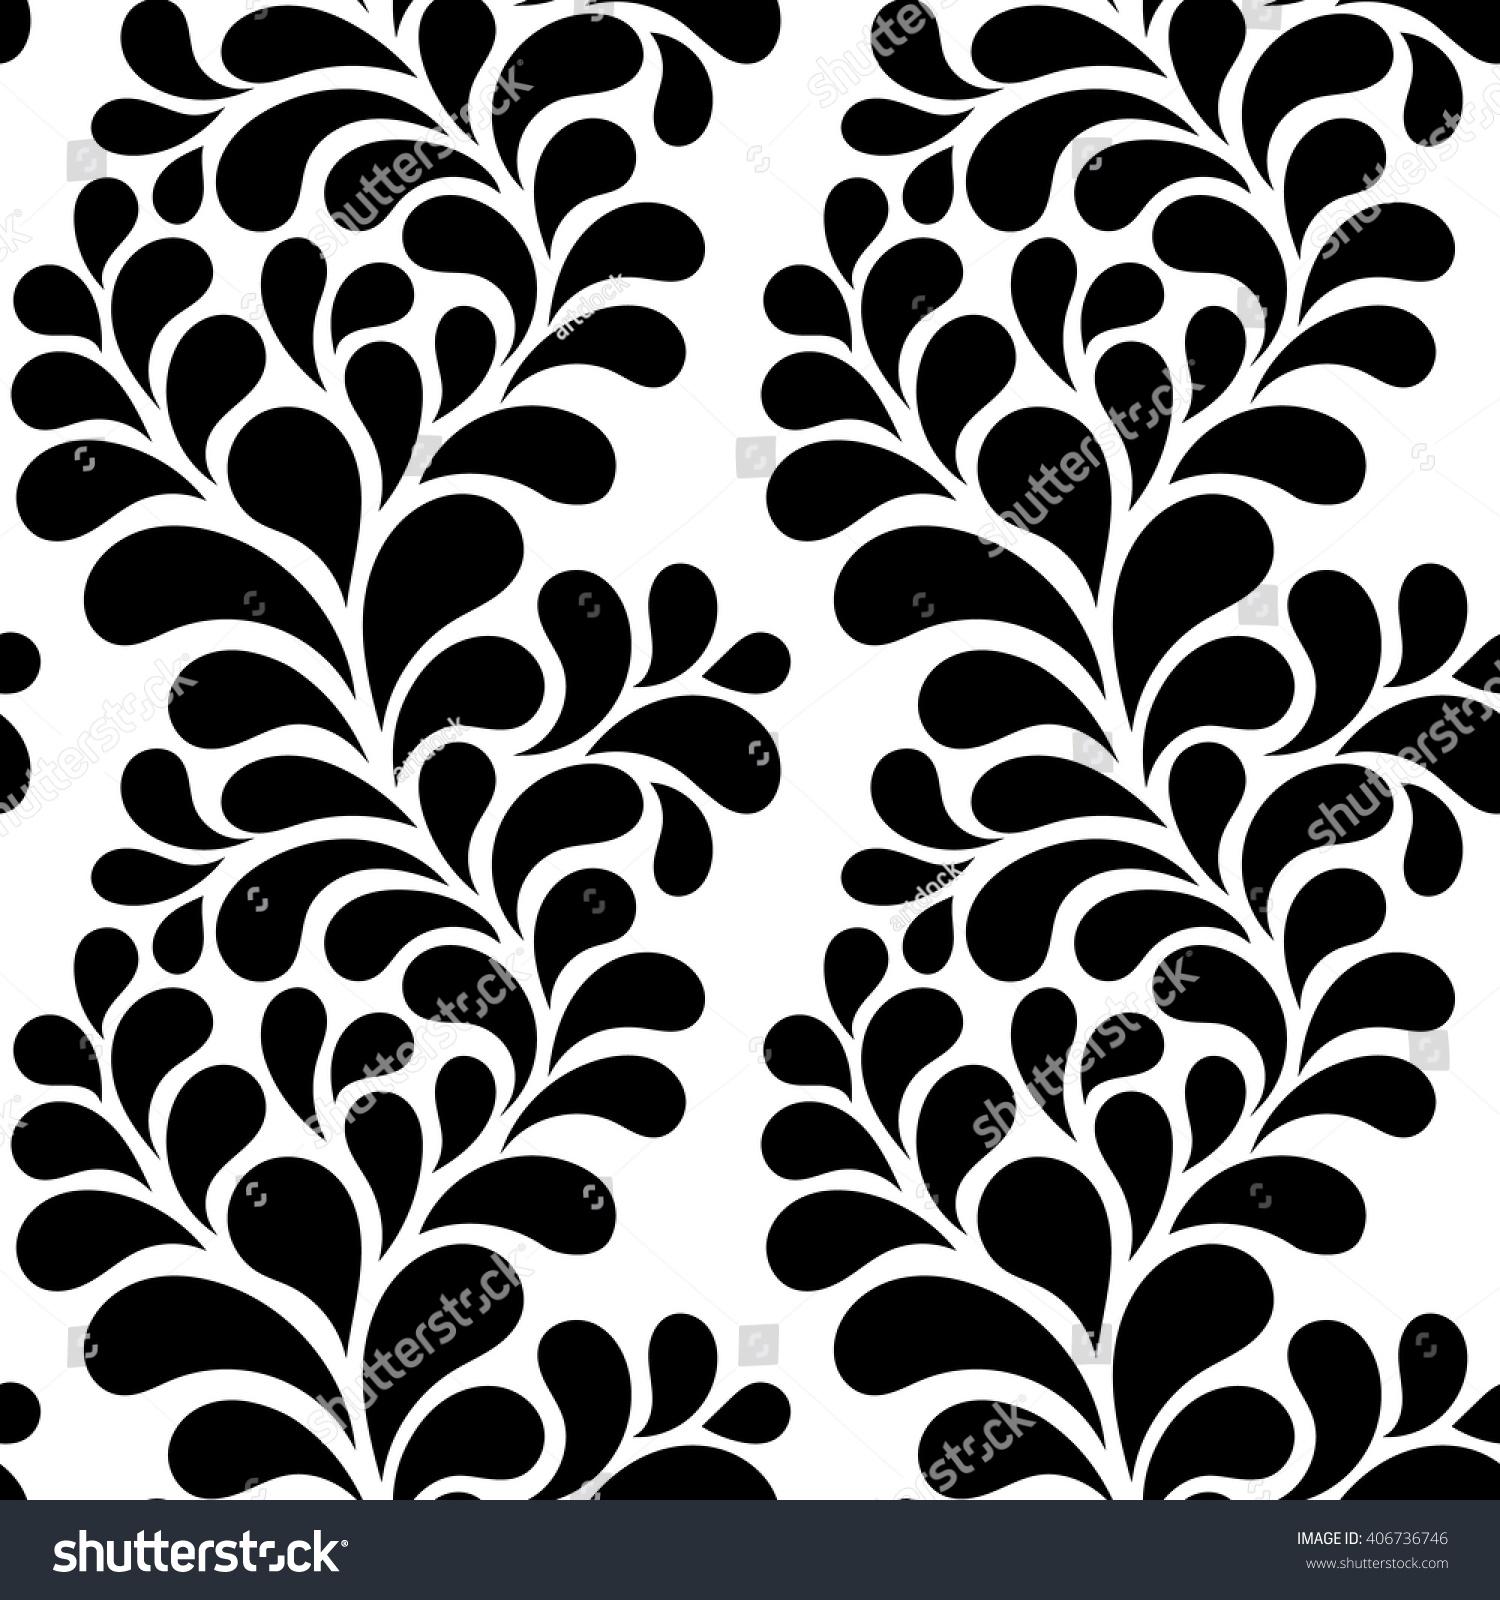 Vector Illustration Seamless Abstract Pattern Decorative